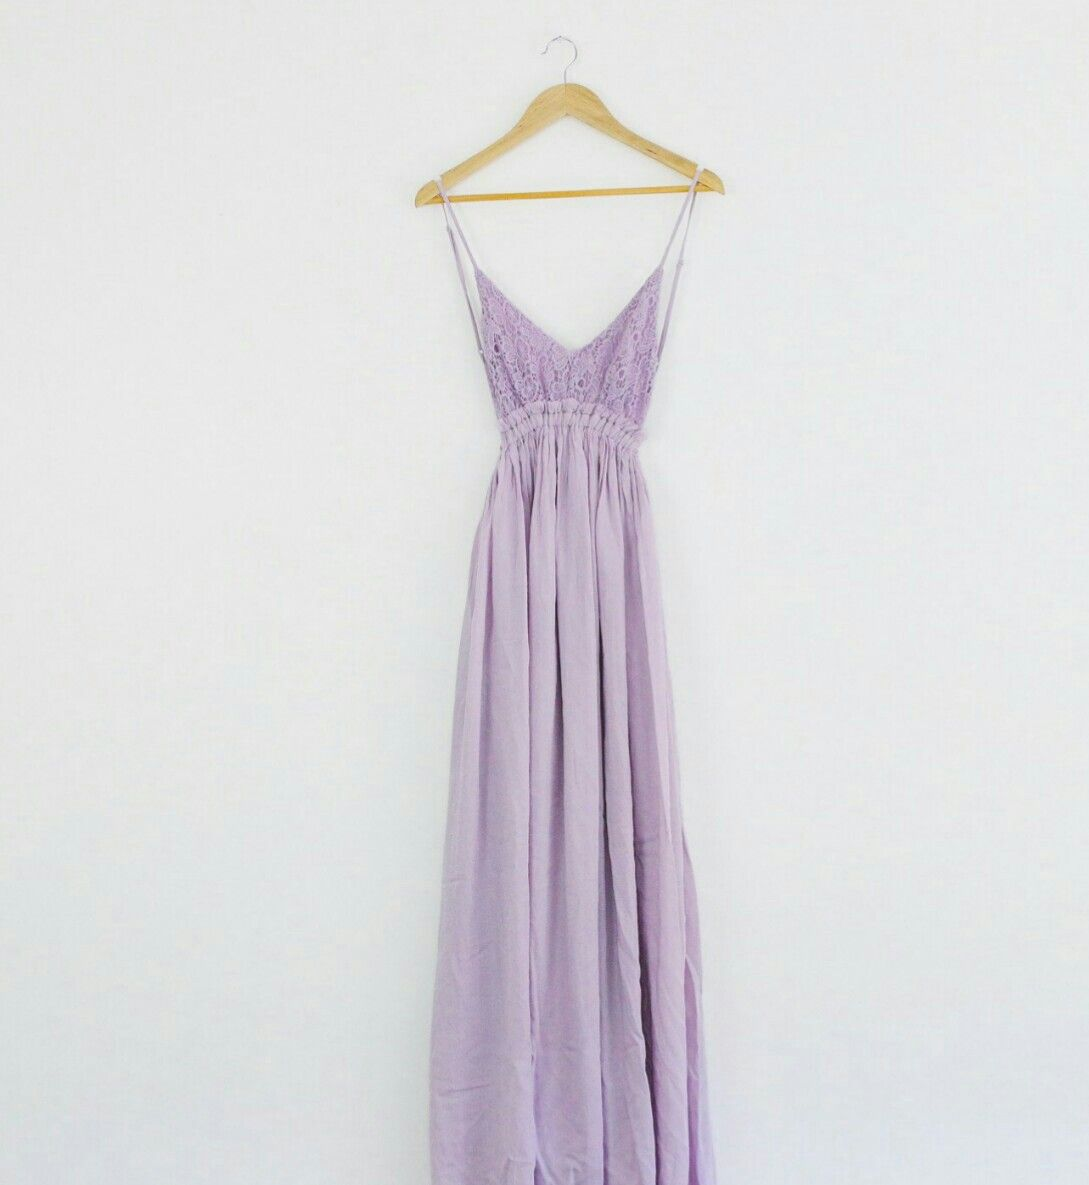 Lilac lace maxi dress #ShopAOF